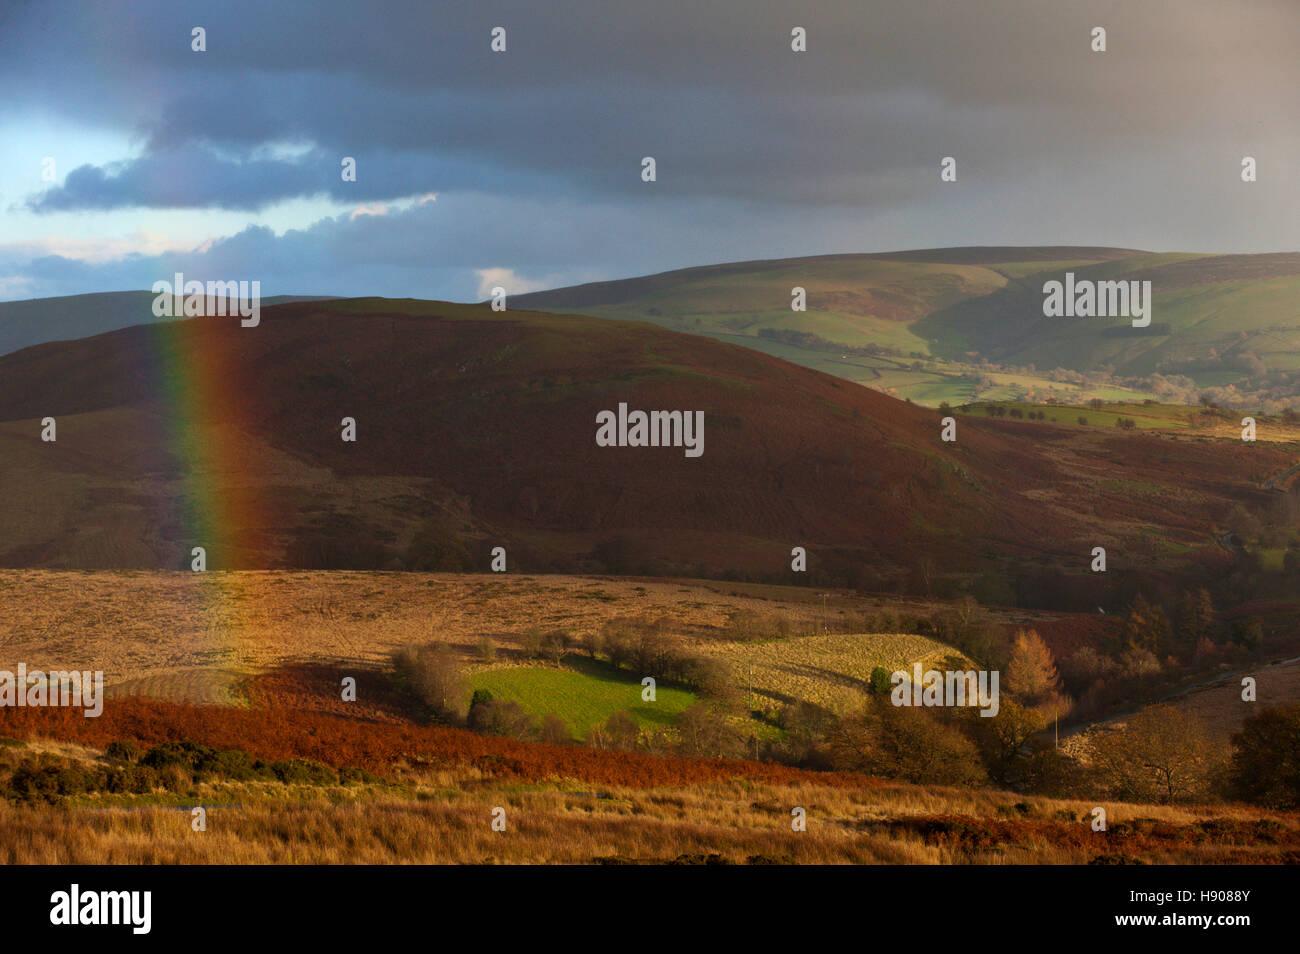 Llandrindod Wells, Powys, Wales, UK. 17th November, 2016. A rainbow is seen over the Powys landscape near LLandrindod - Stock Image